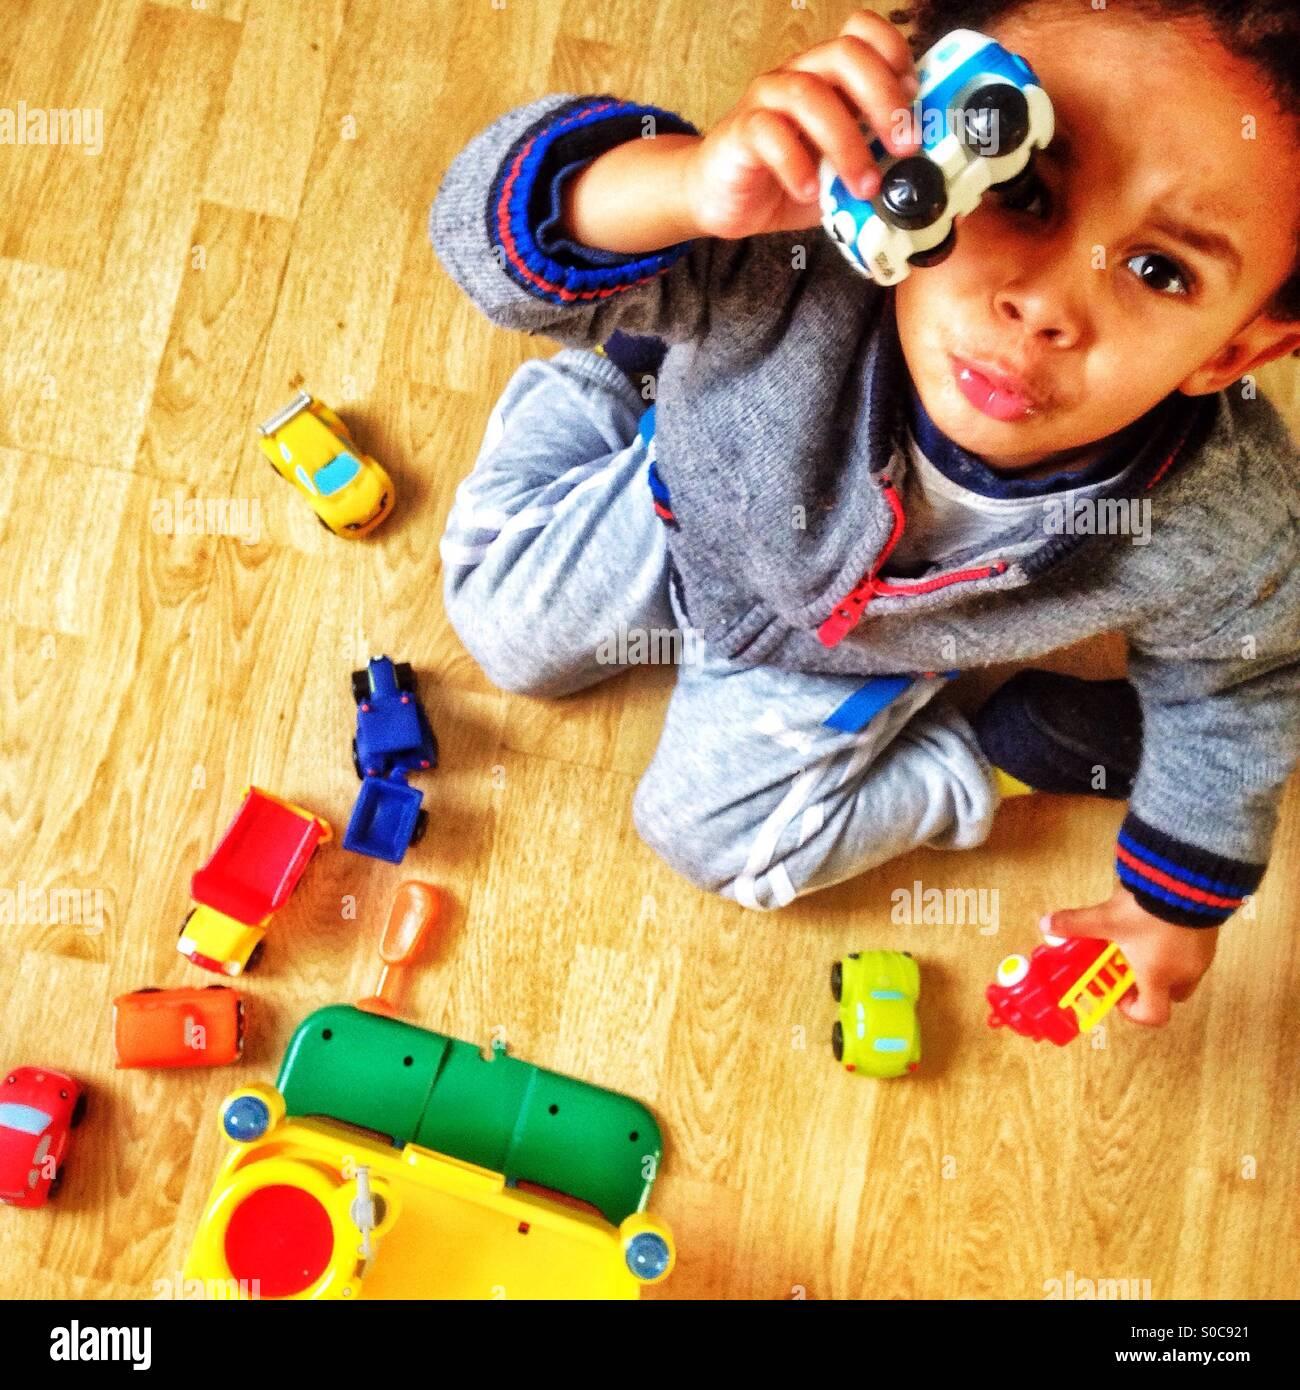 Petit Garçon jouant avec ses jouets. Photo Stock